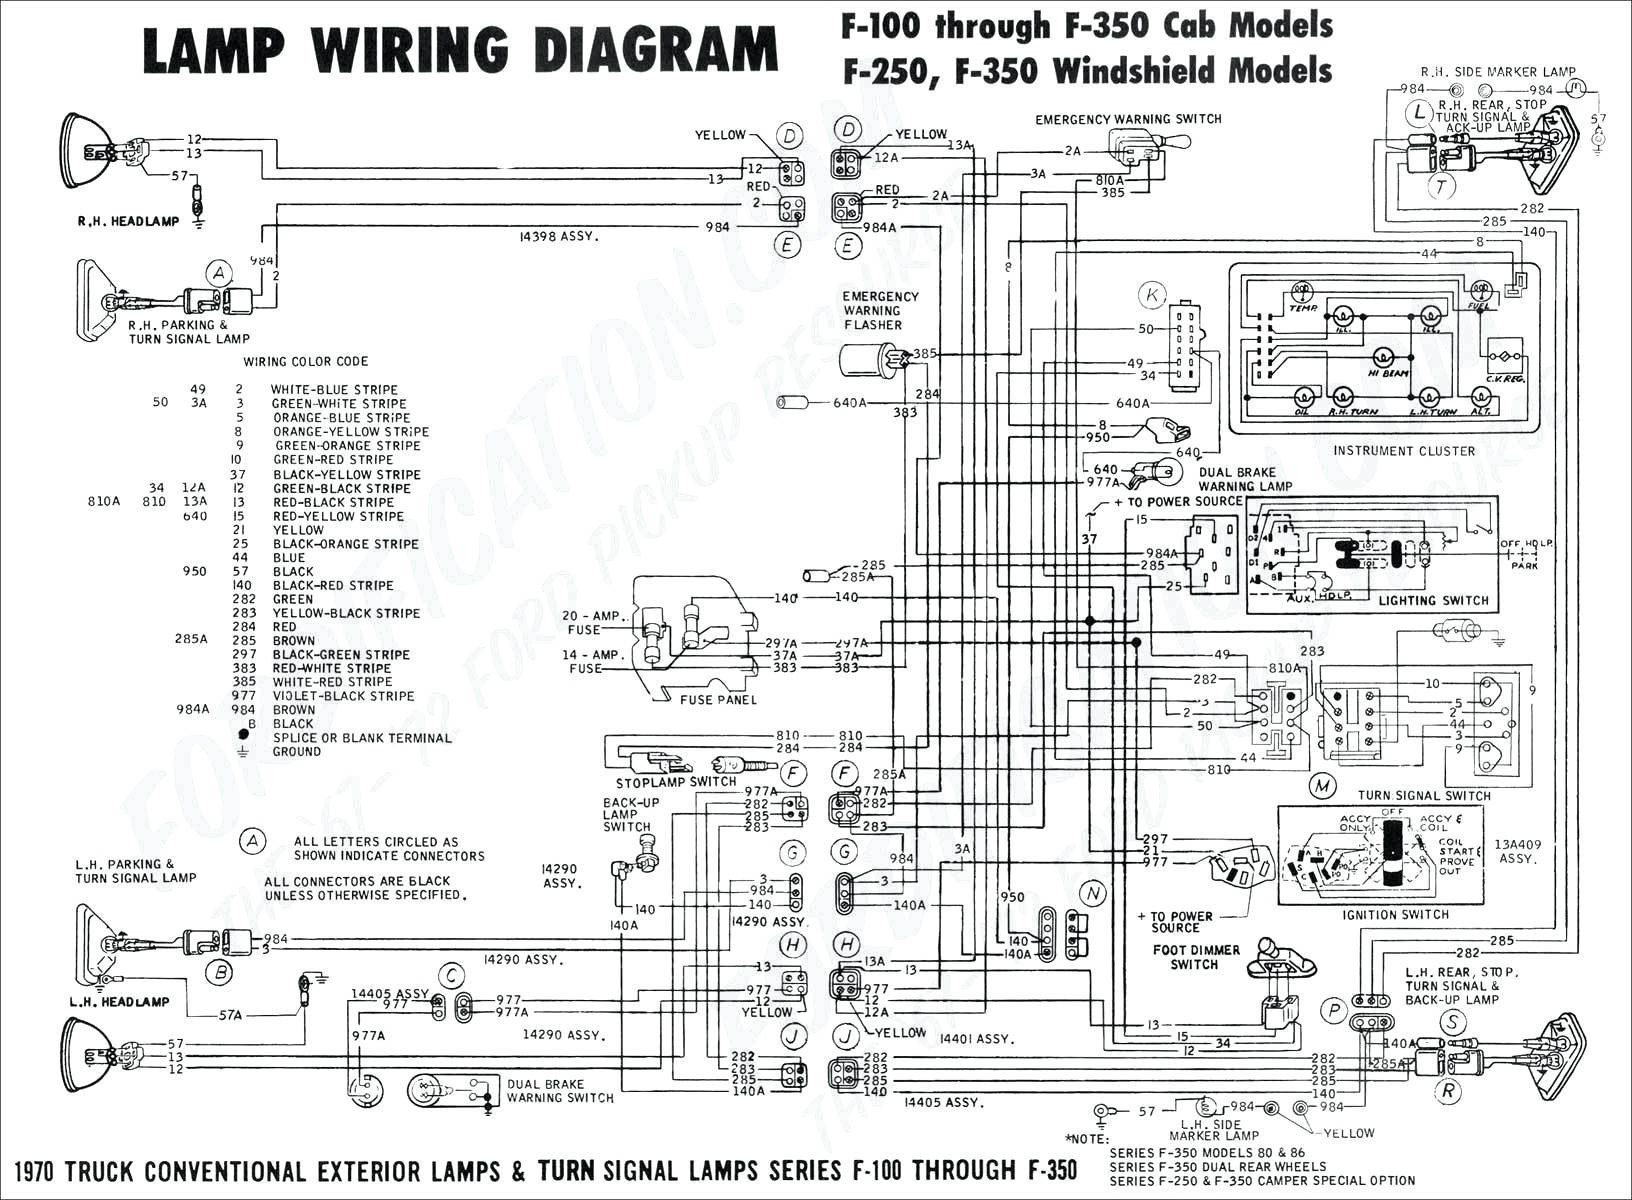 2002 Chevy Tracker Engine Diagram Engine Wiring Lucas Ignition Switch Wiring Diagram Of 2002 Chevy Tracker Engine Diagram